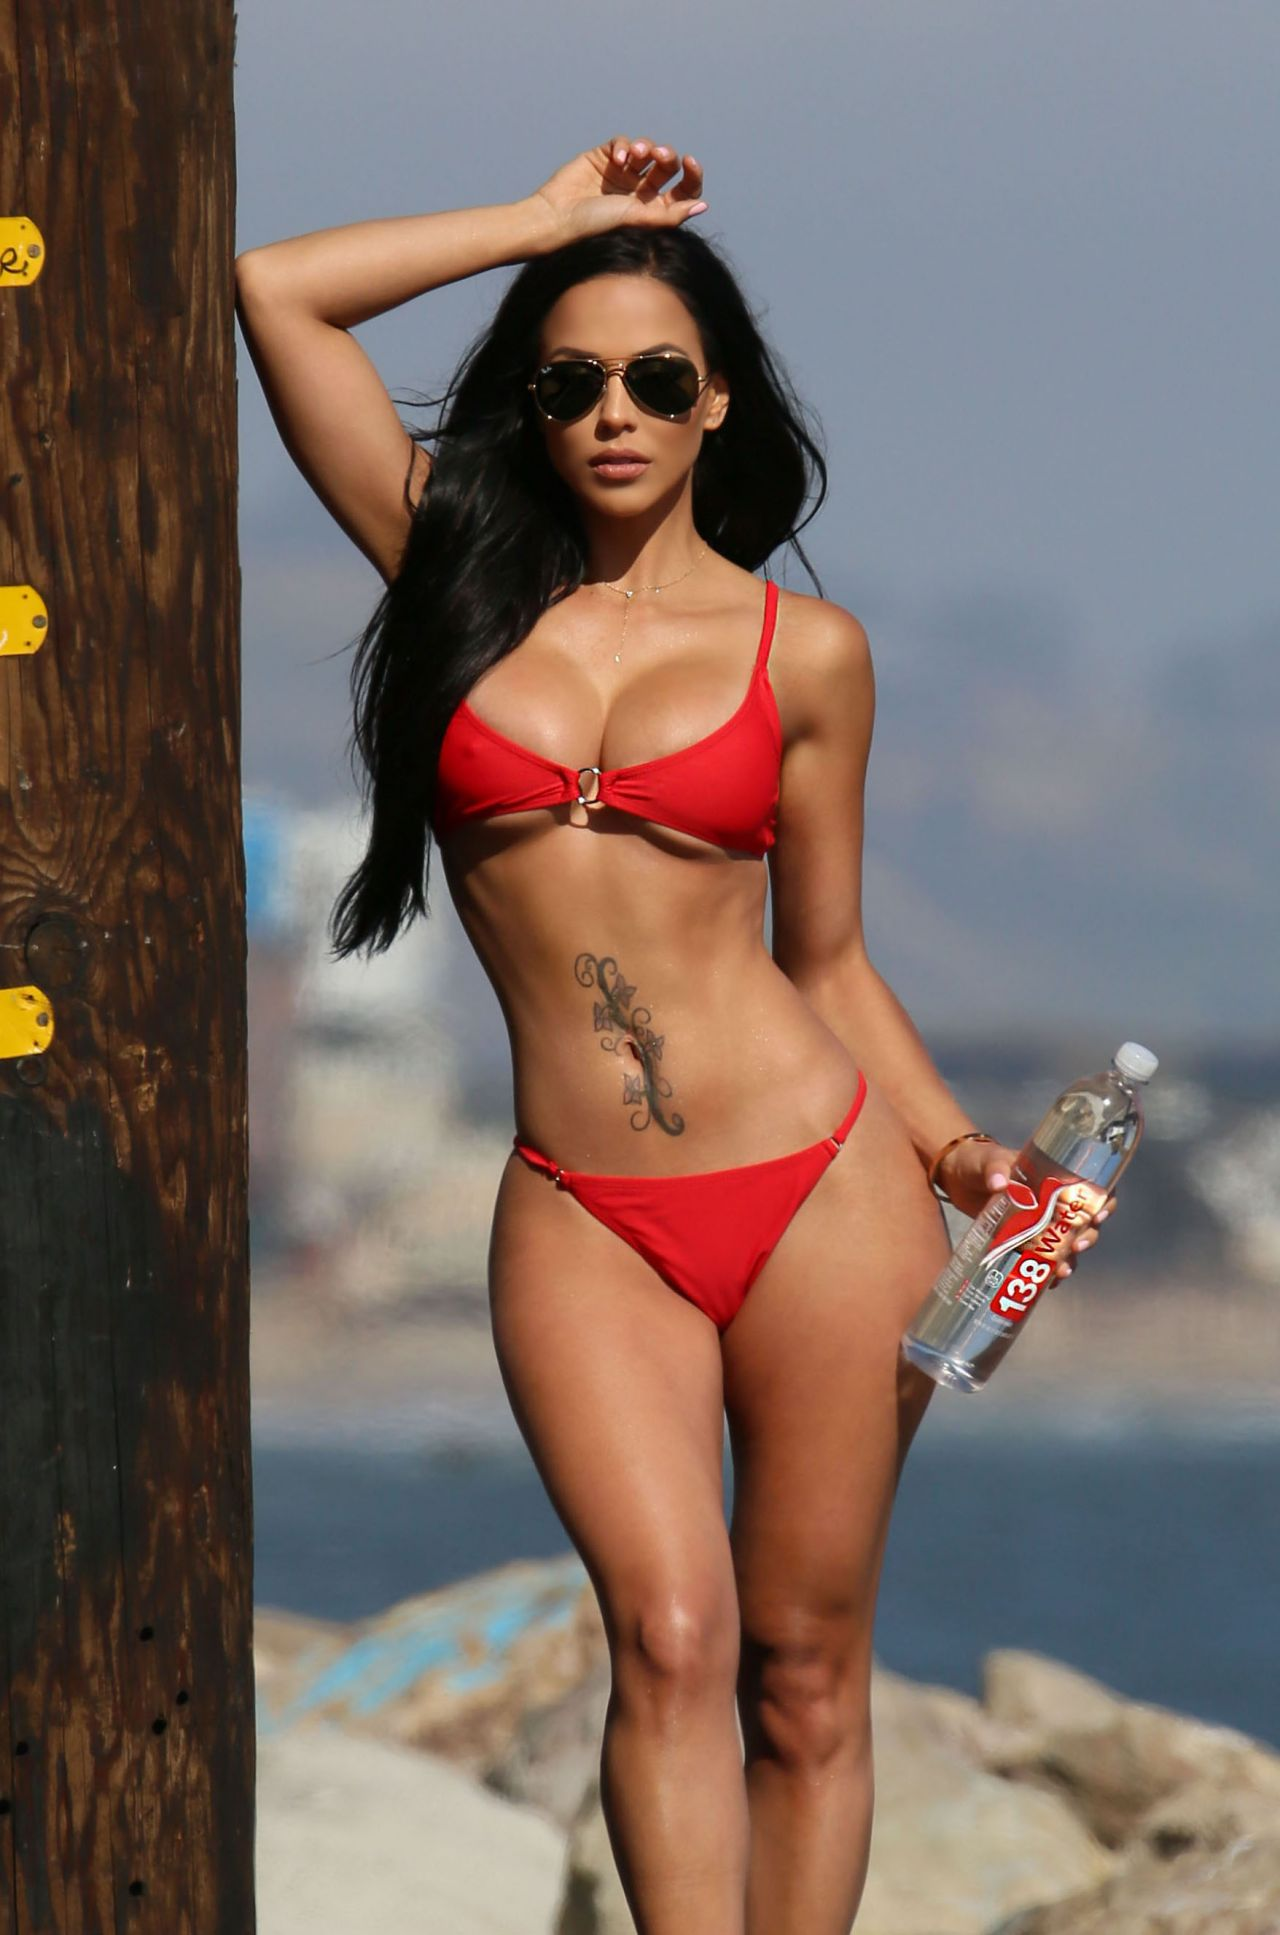 Melissa riso bikini photos